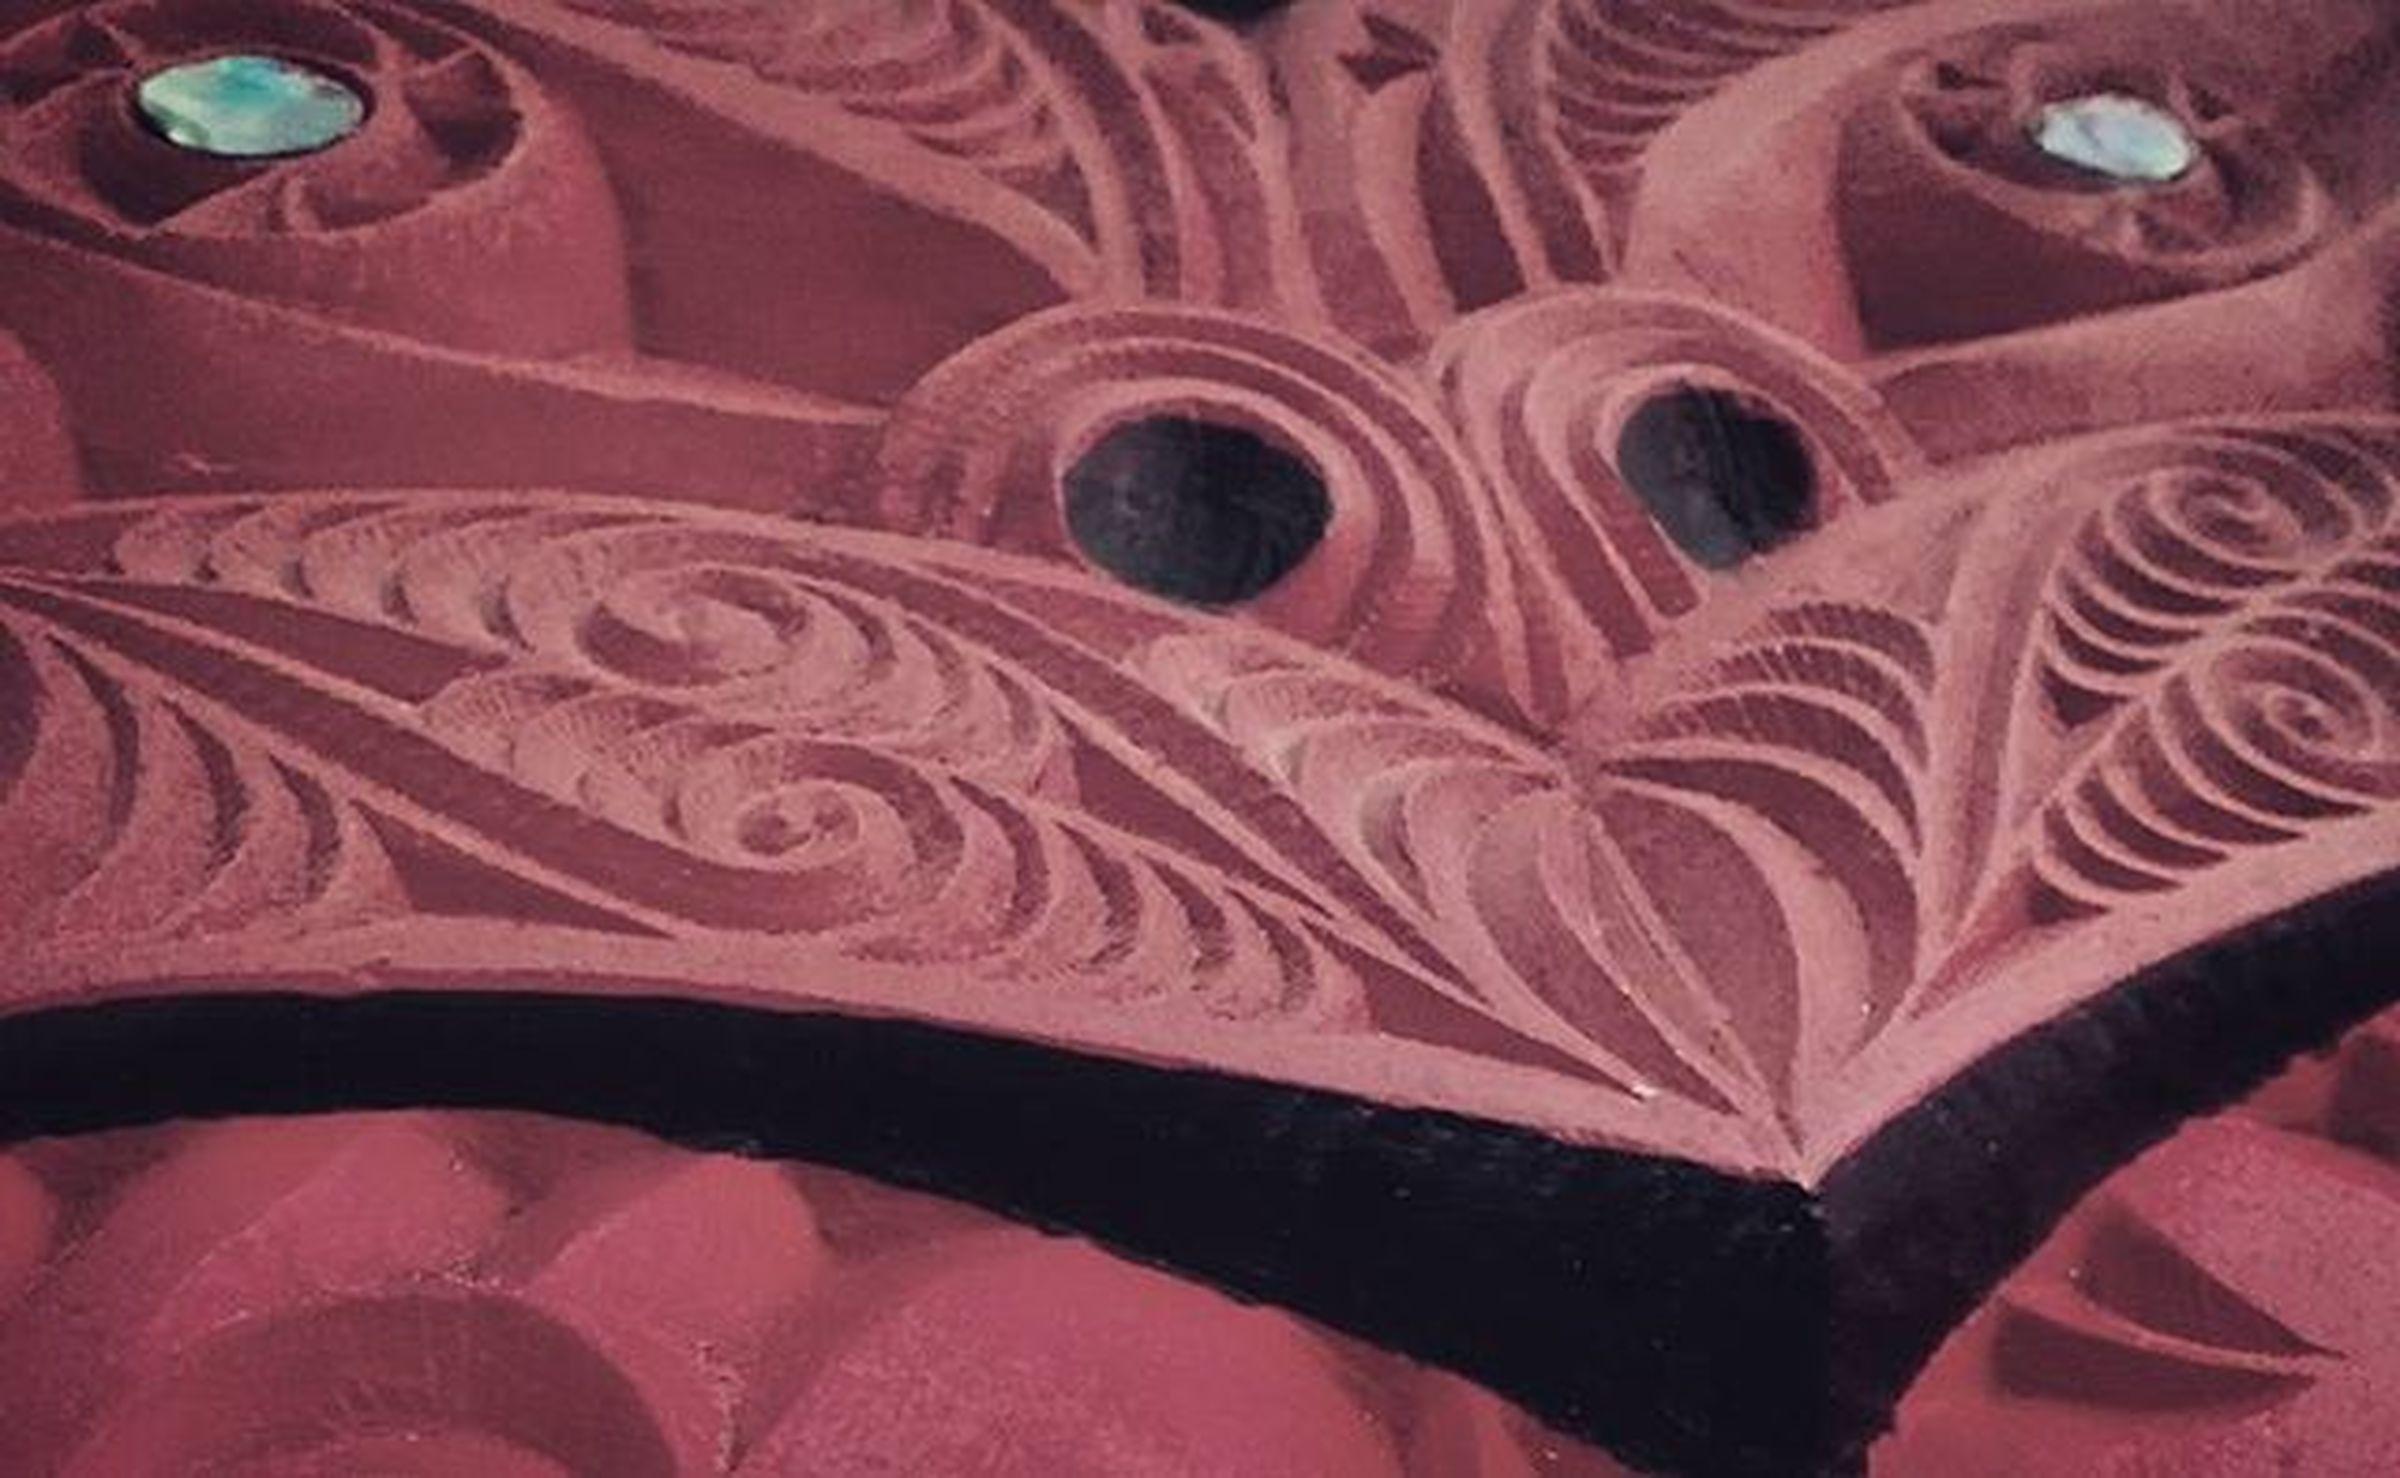 Maori Carving Whakairo Aotearoa NZ Newzealand Maoriculture 21stkey Brown Filltheframe_nio Wmm_brown Wooden_hue_art